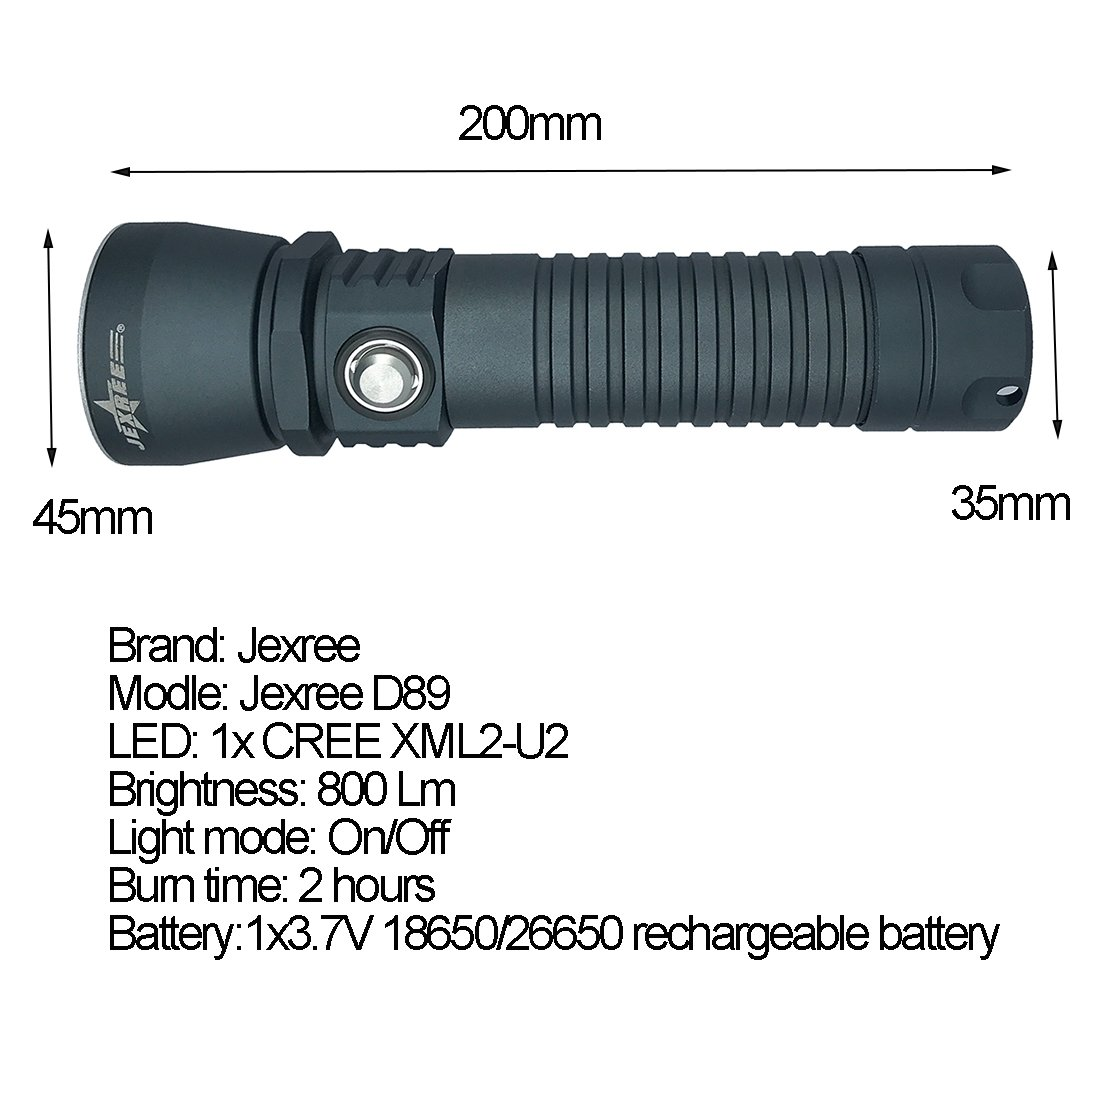 Amazon.com: Jexree D89 - Linterna de buceo profesional ...